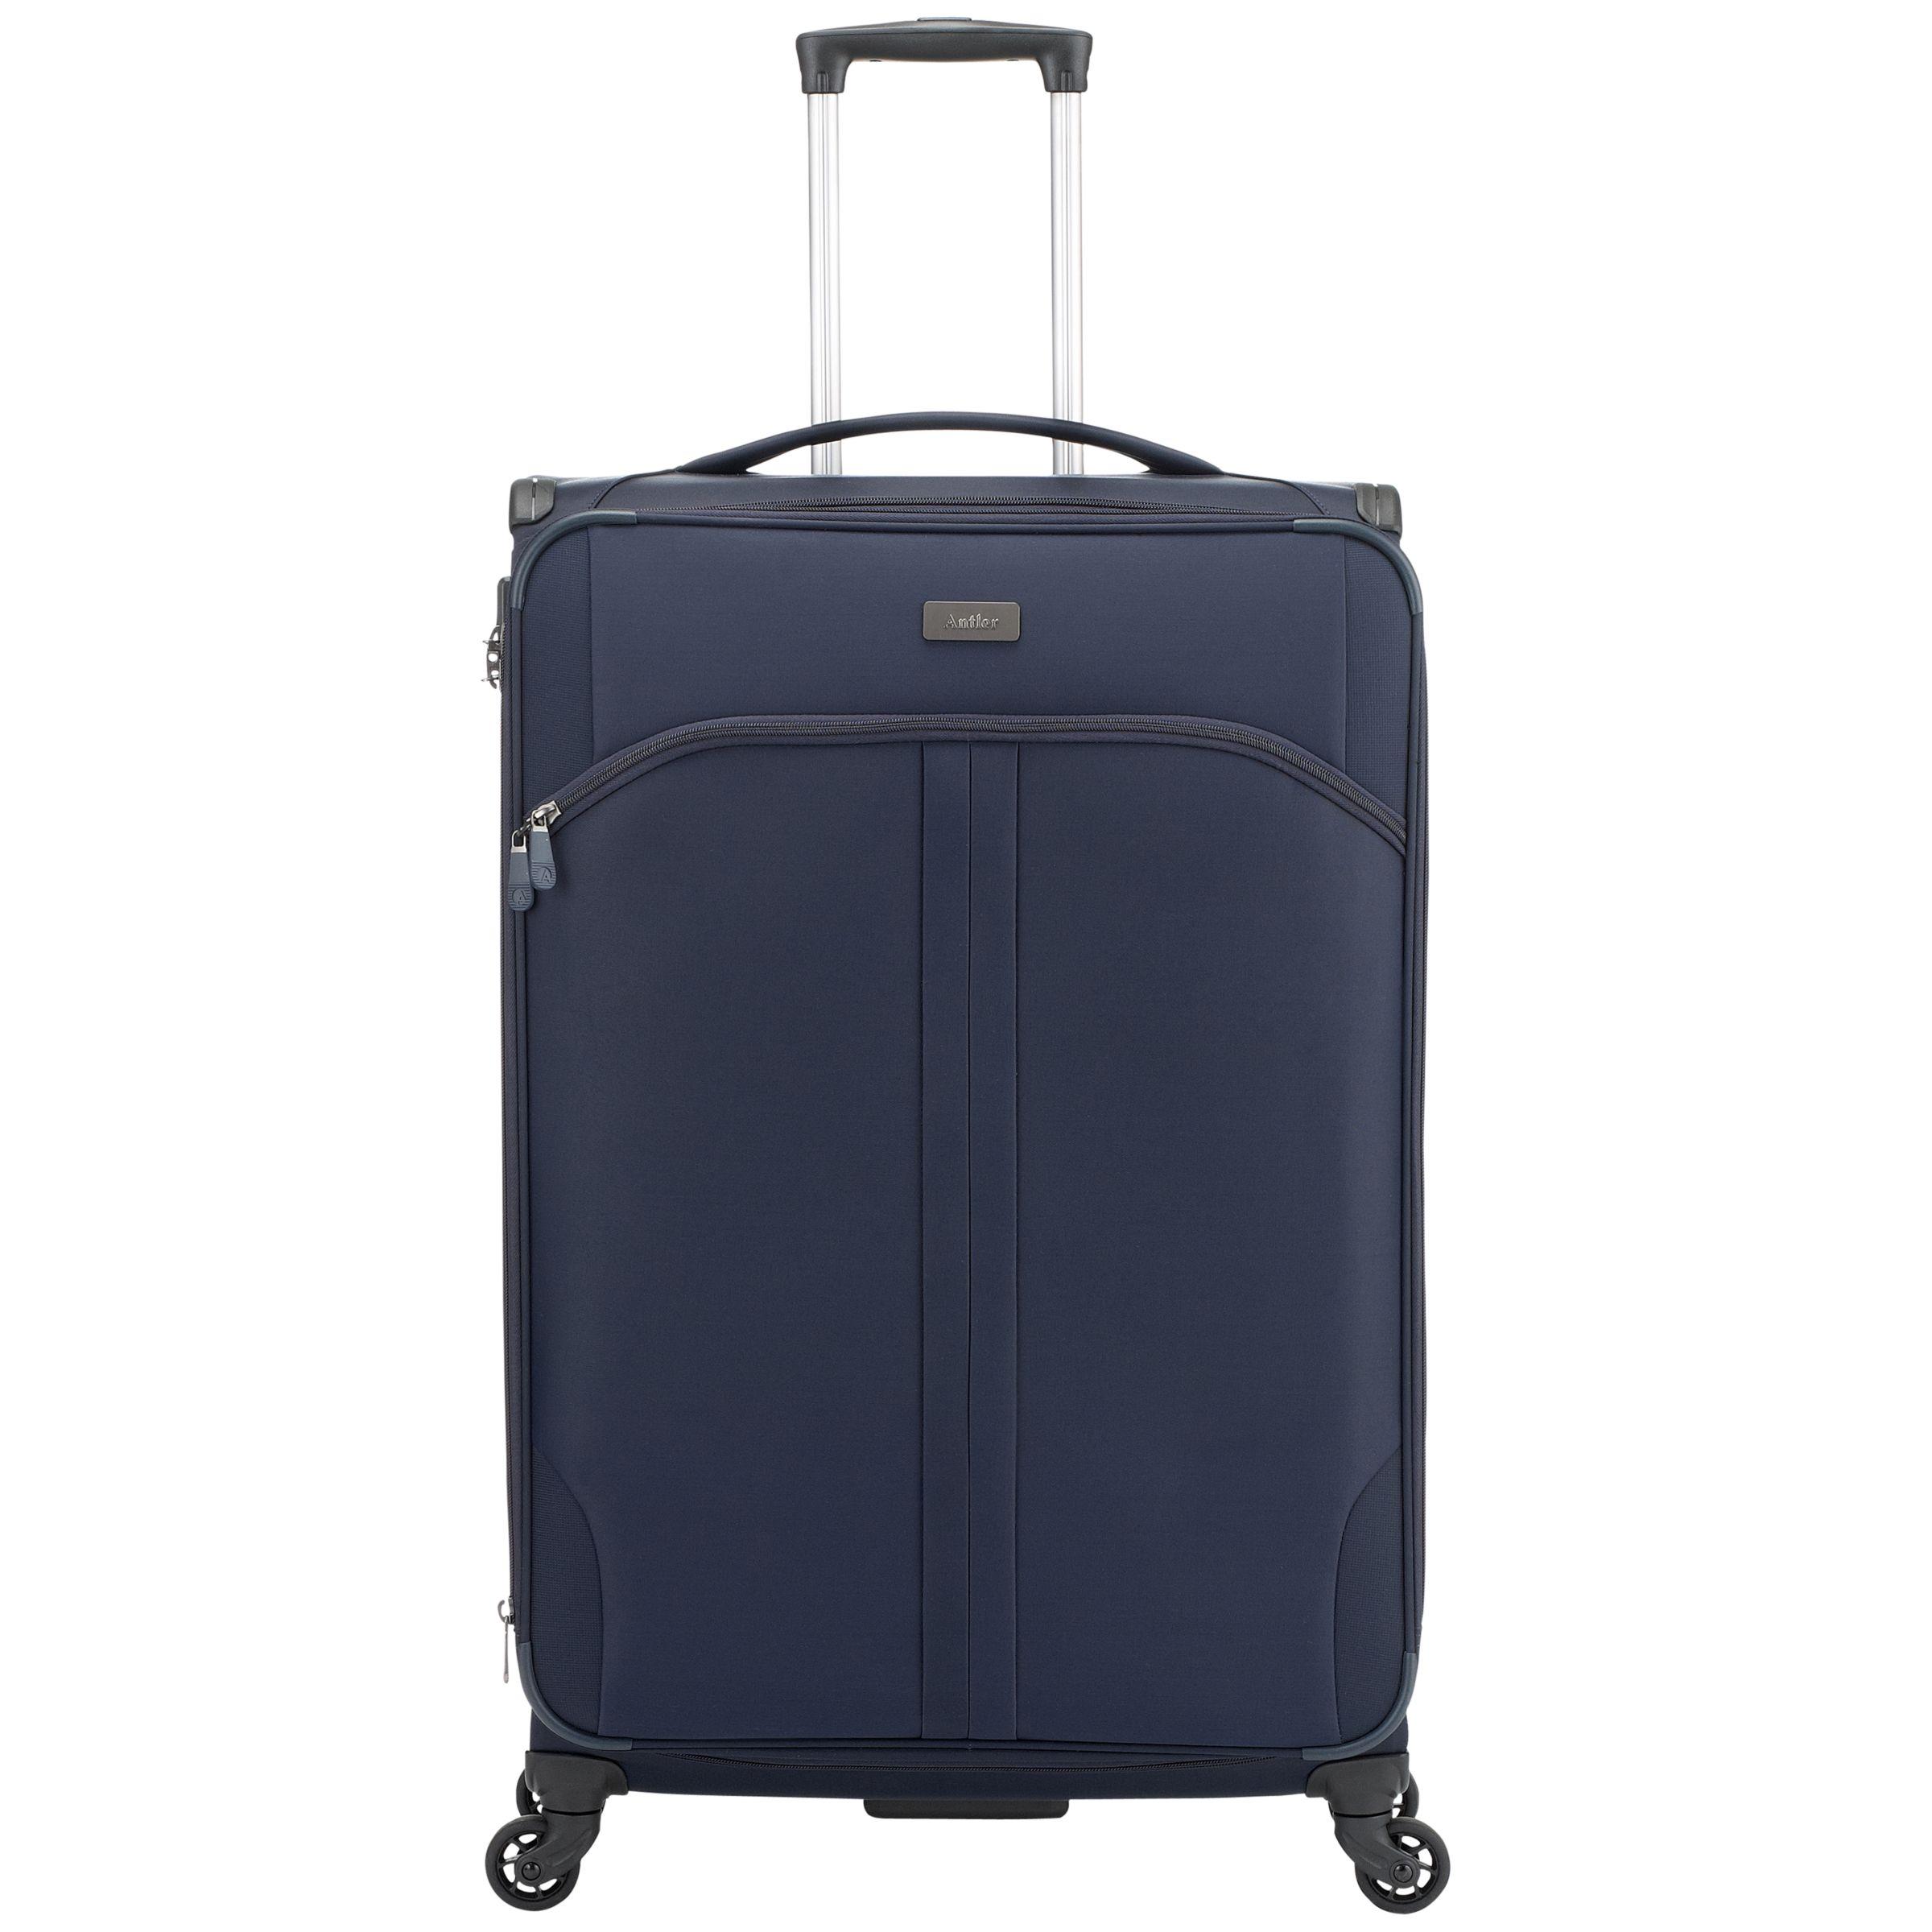 Antler Antler Aire 4-Wheel 80cm Large Suitcase